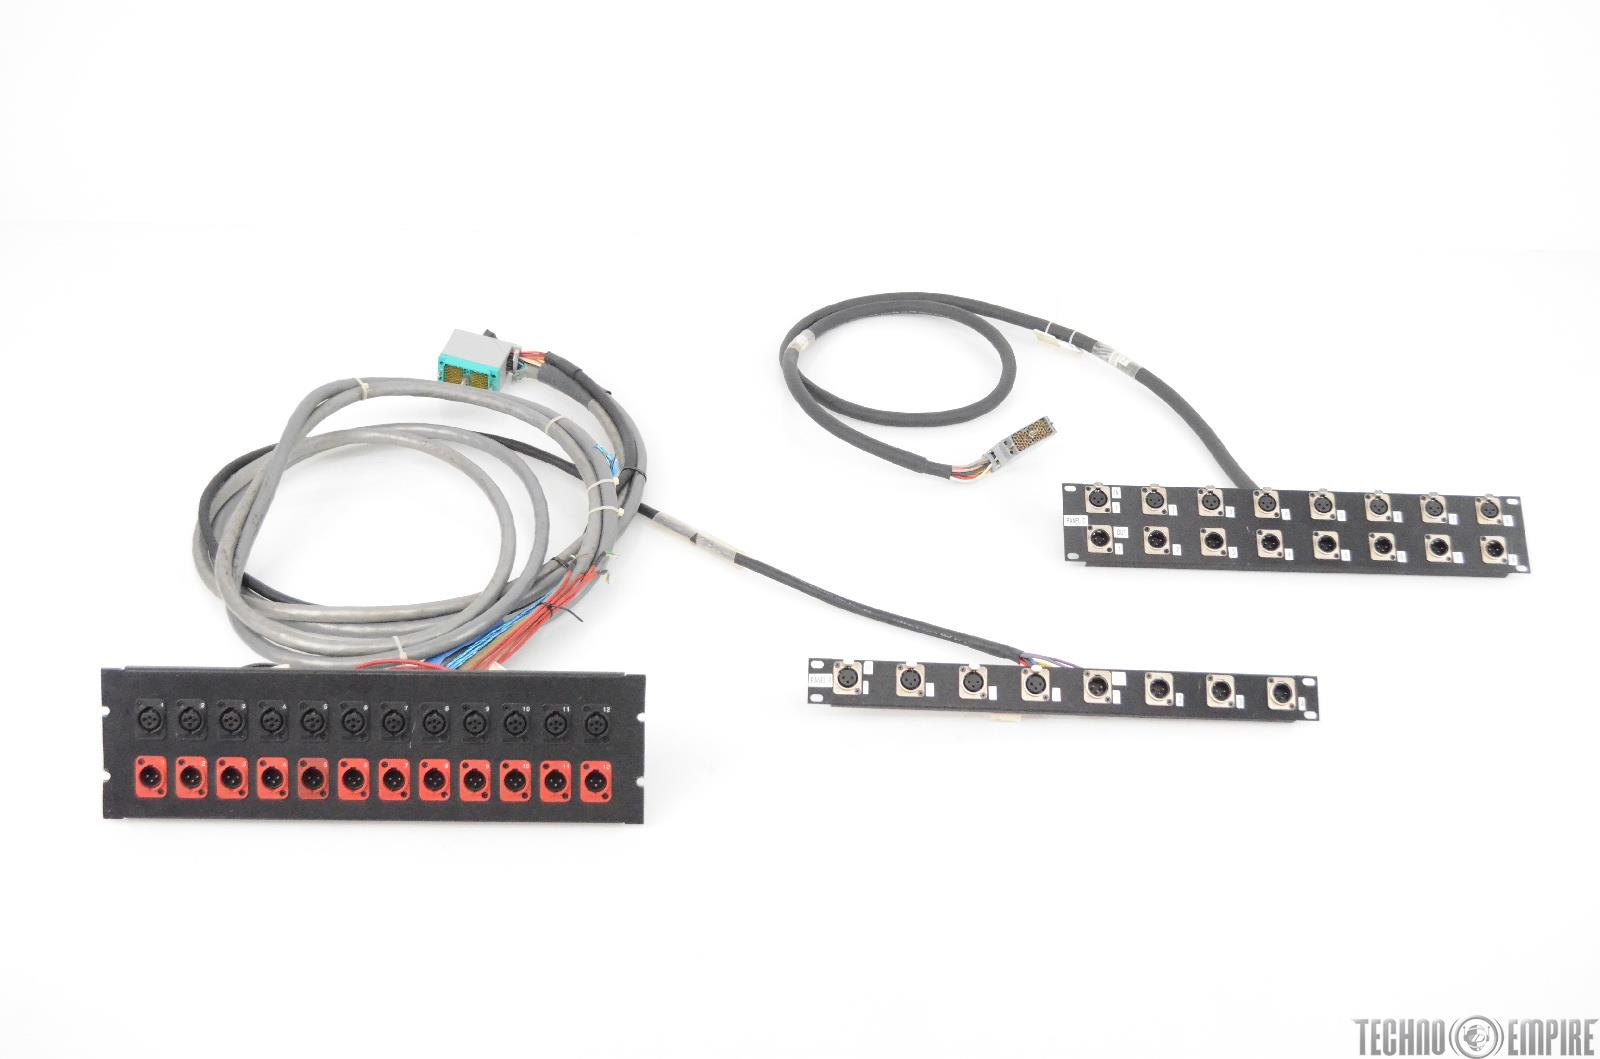 Mogami Tt Edac Xlr Wiring Diagram Audio Accessories Studio Panel Patch Bay Cable Network 31327